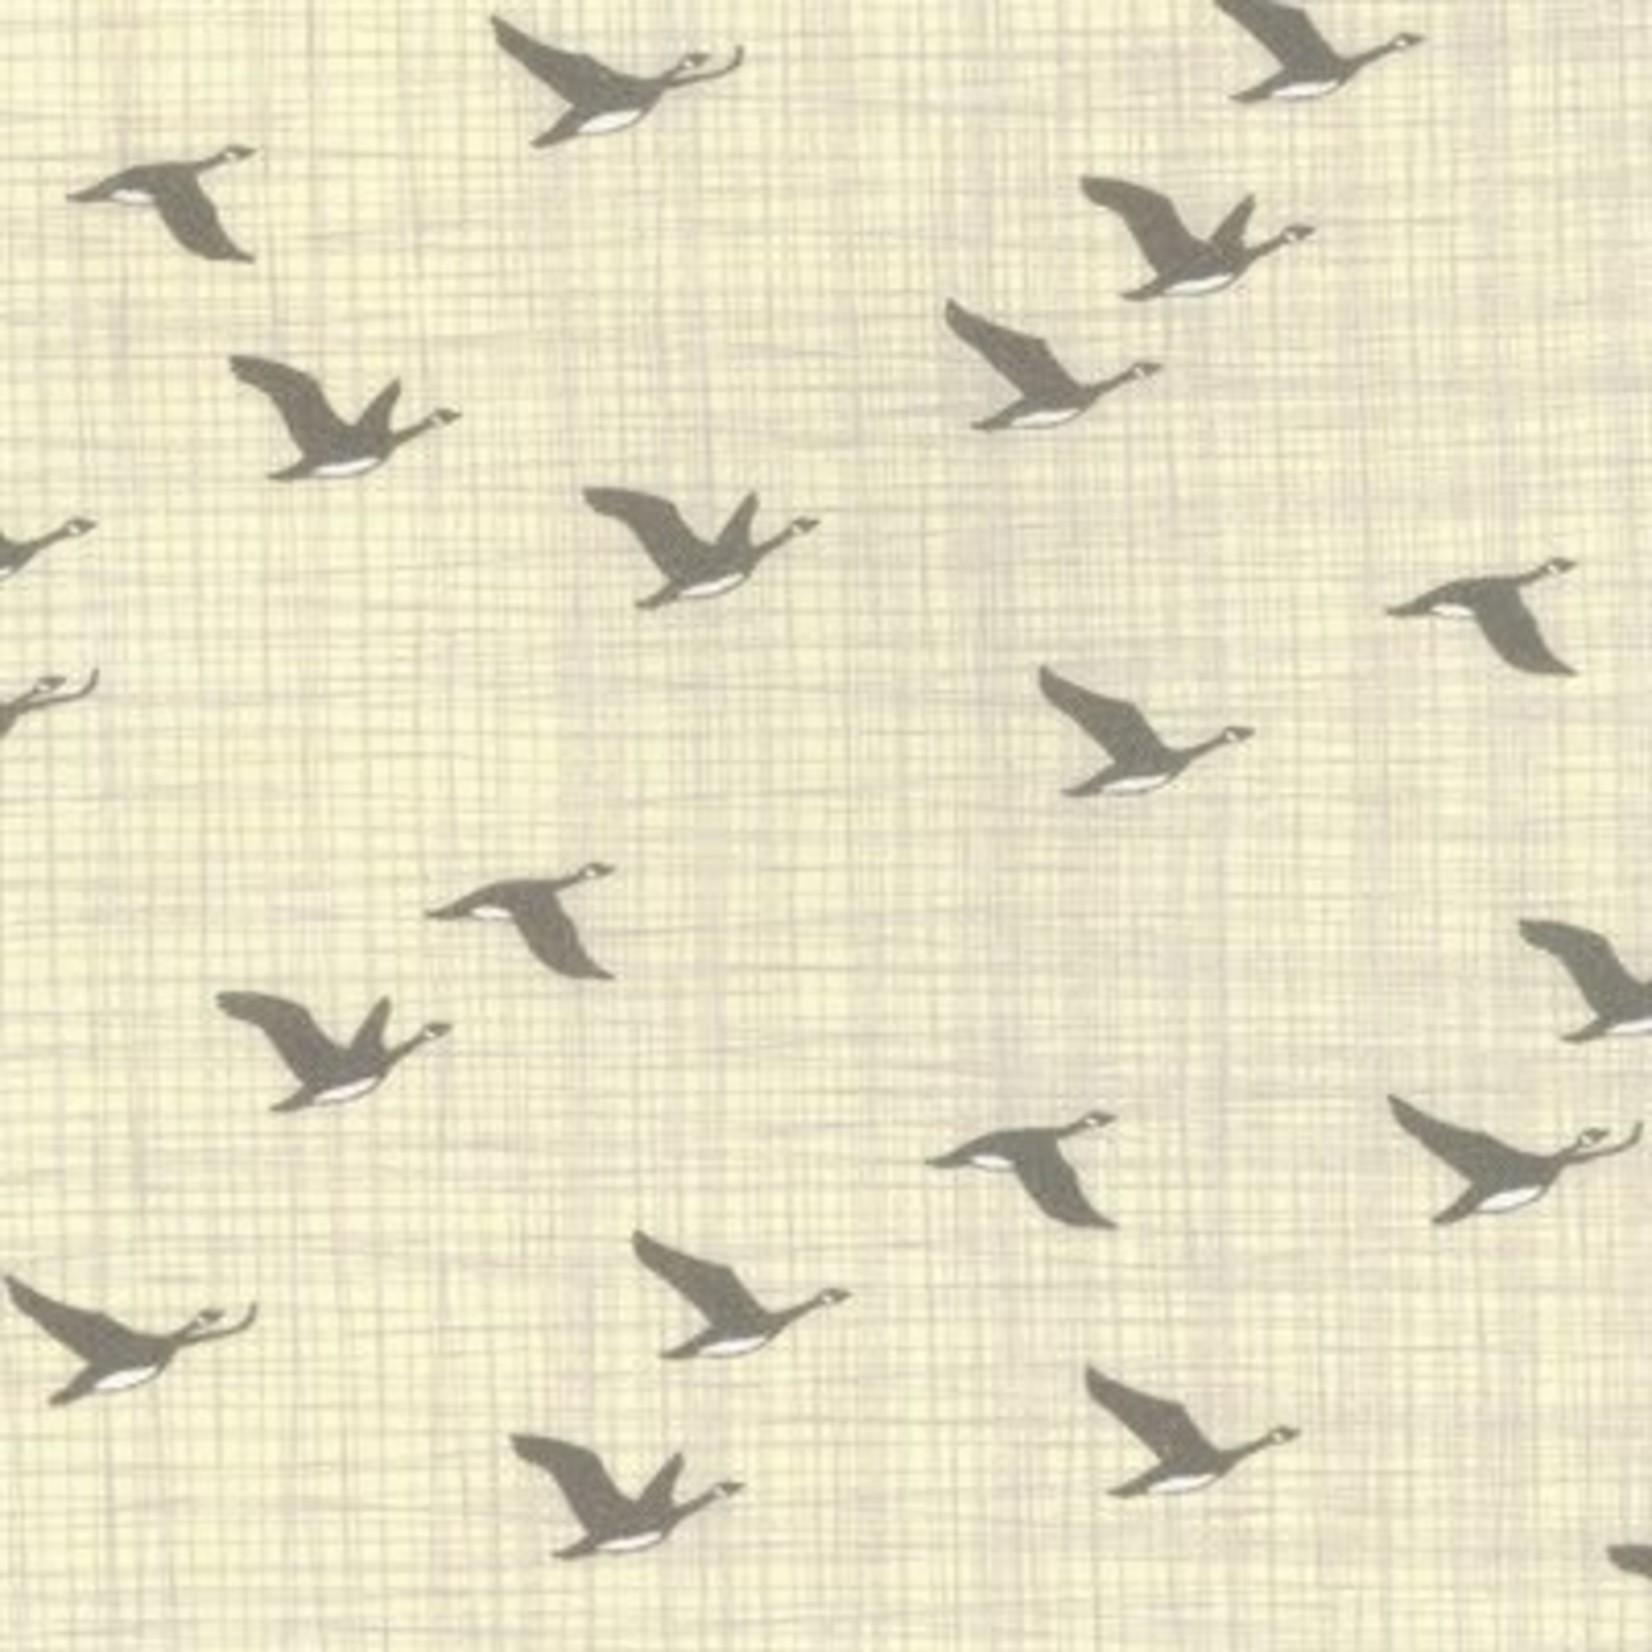 Kate & Birdie Paper Co. True North 2, Geese, Linen 513213-13 per cm or $20/m